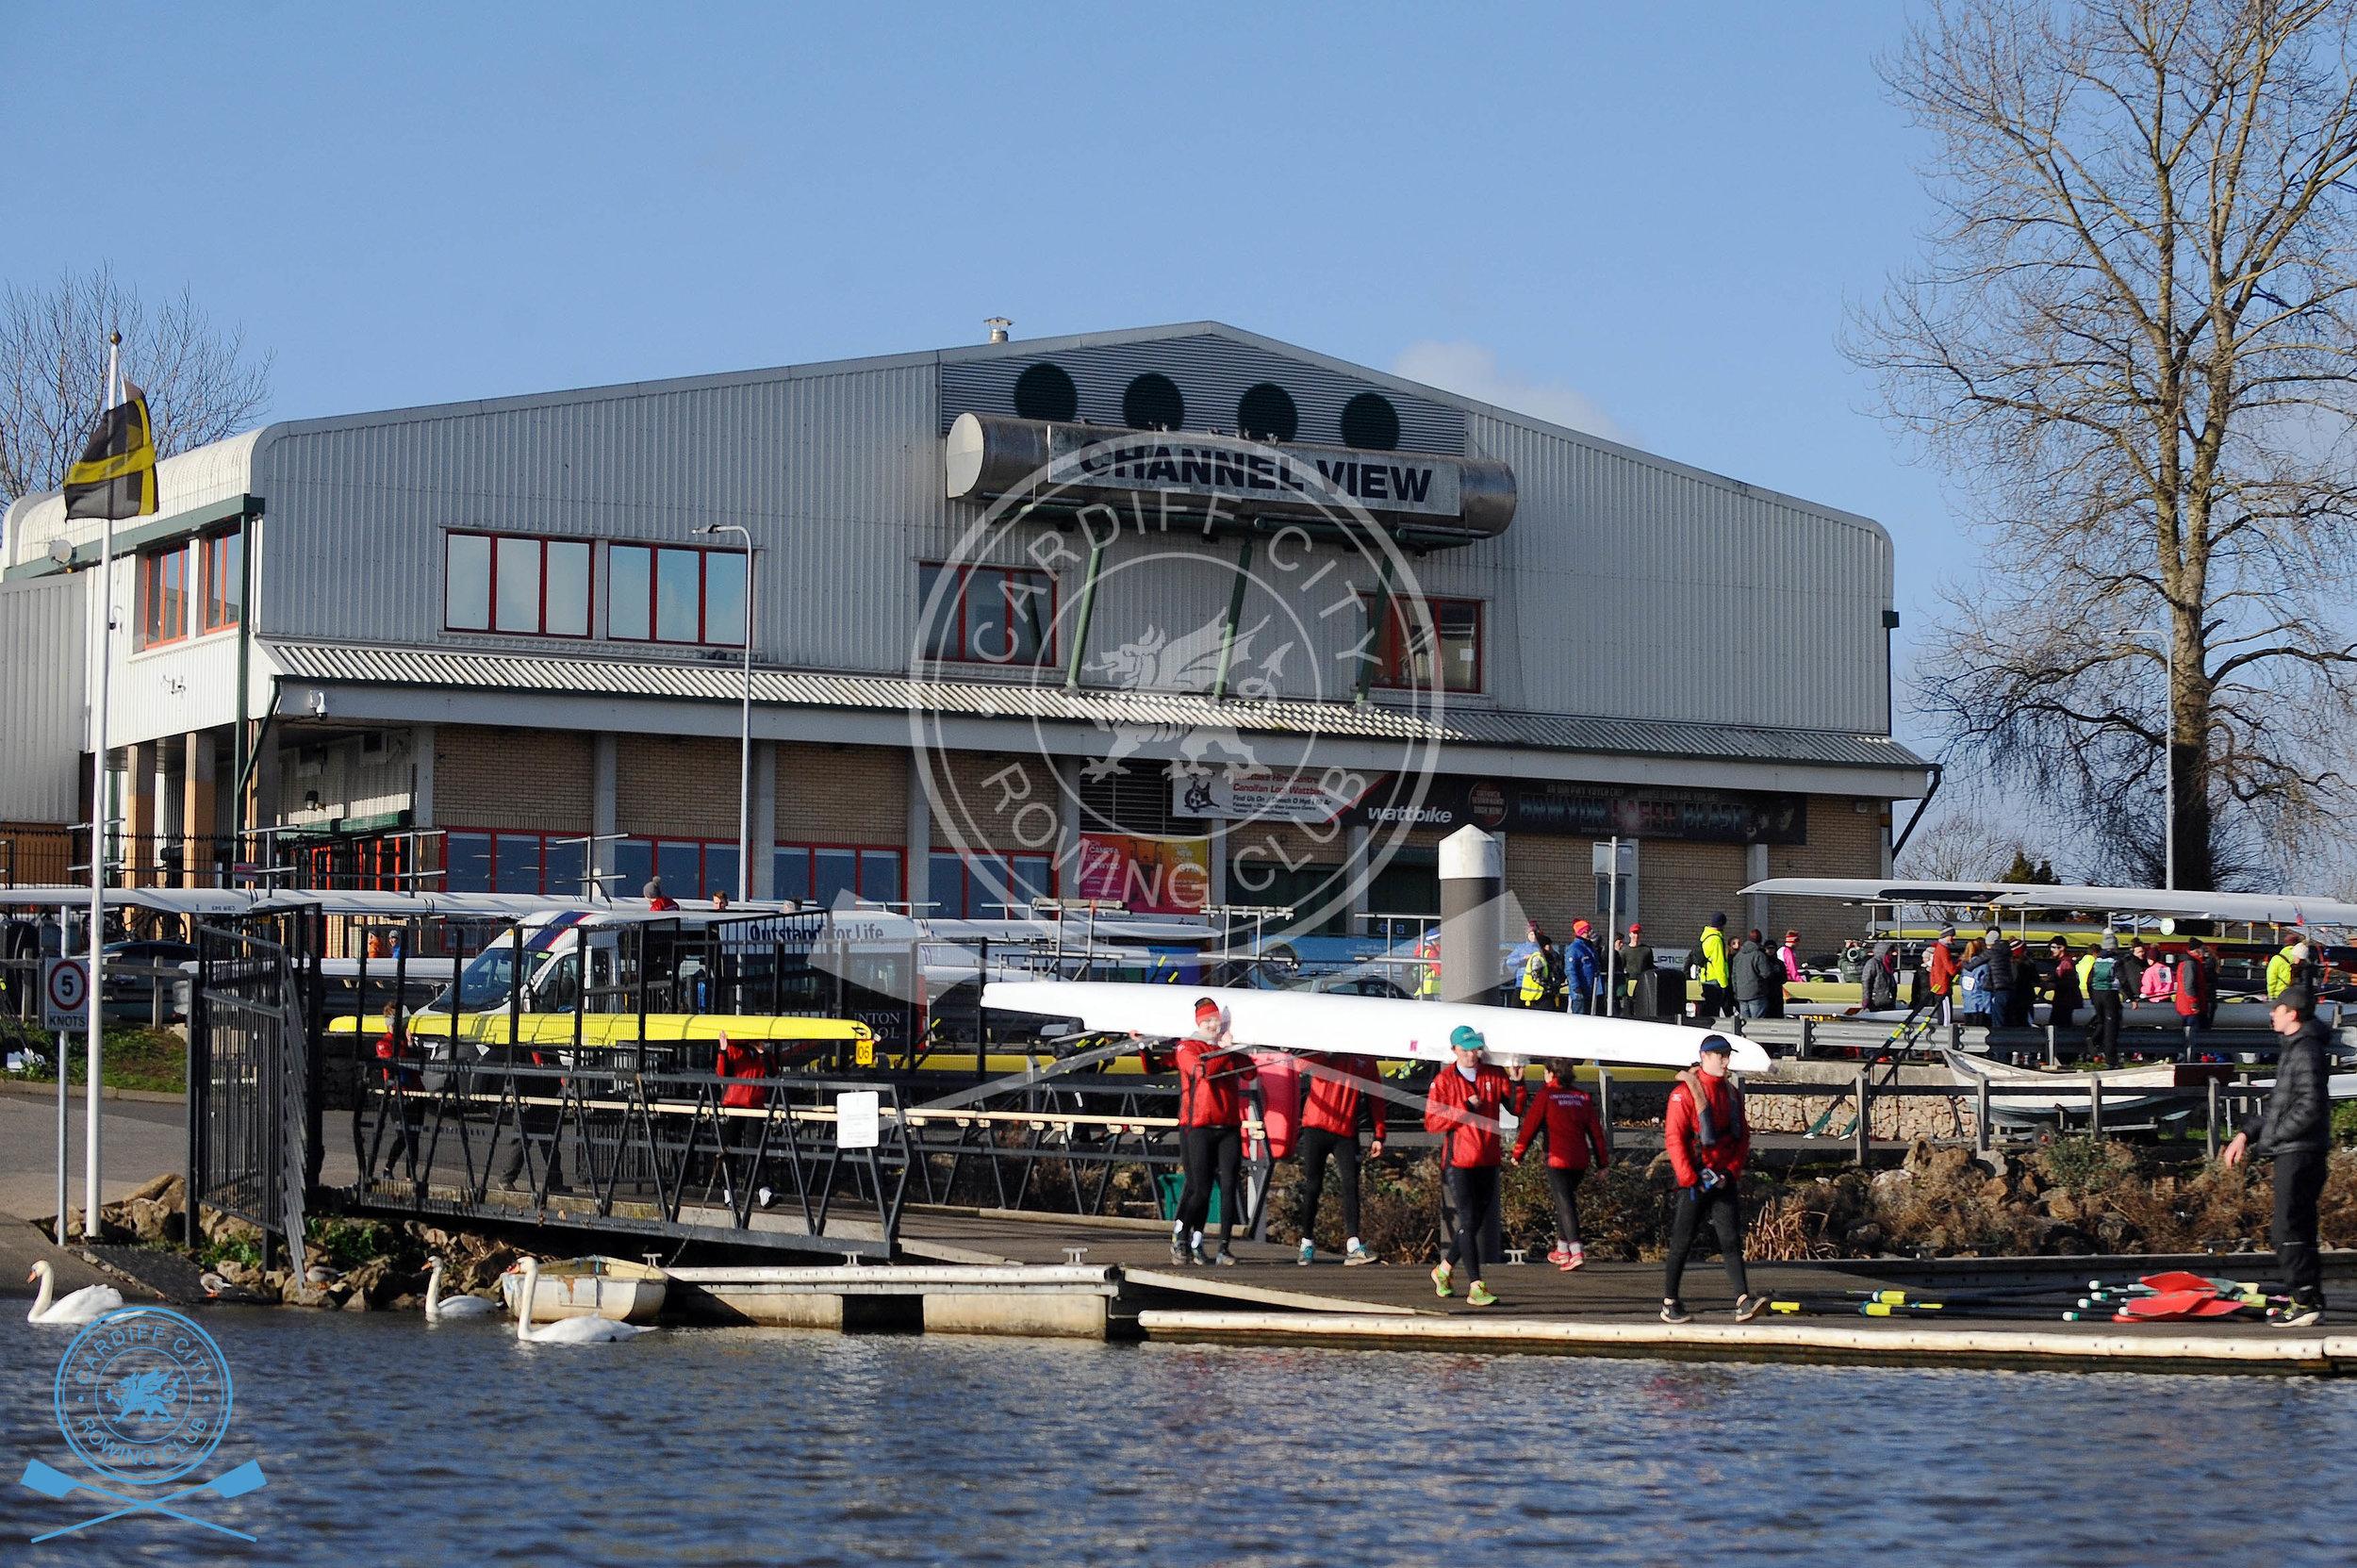 DW_280119_Cardiff_City_Rowing_243.jpg